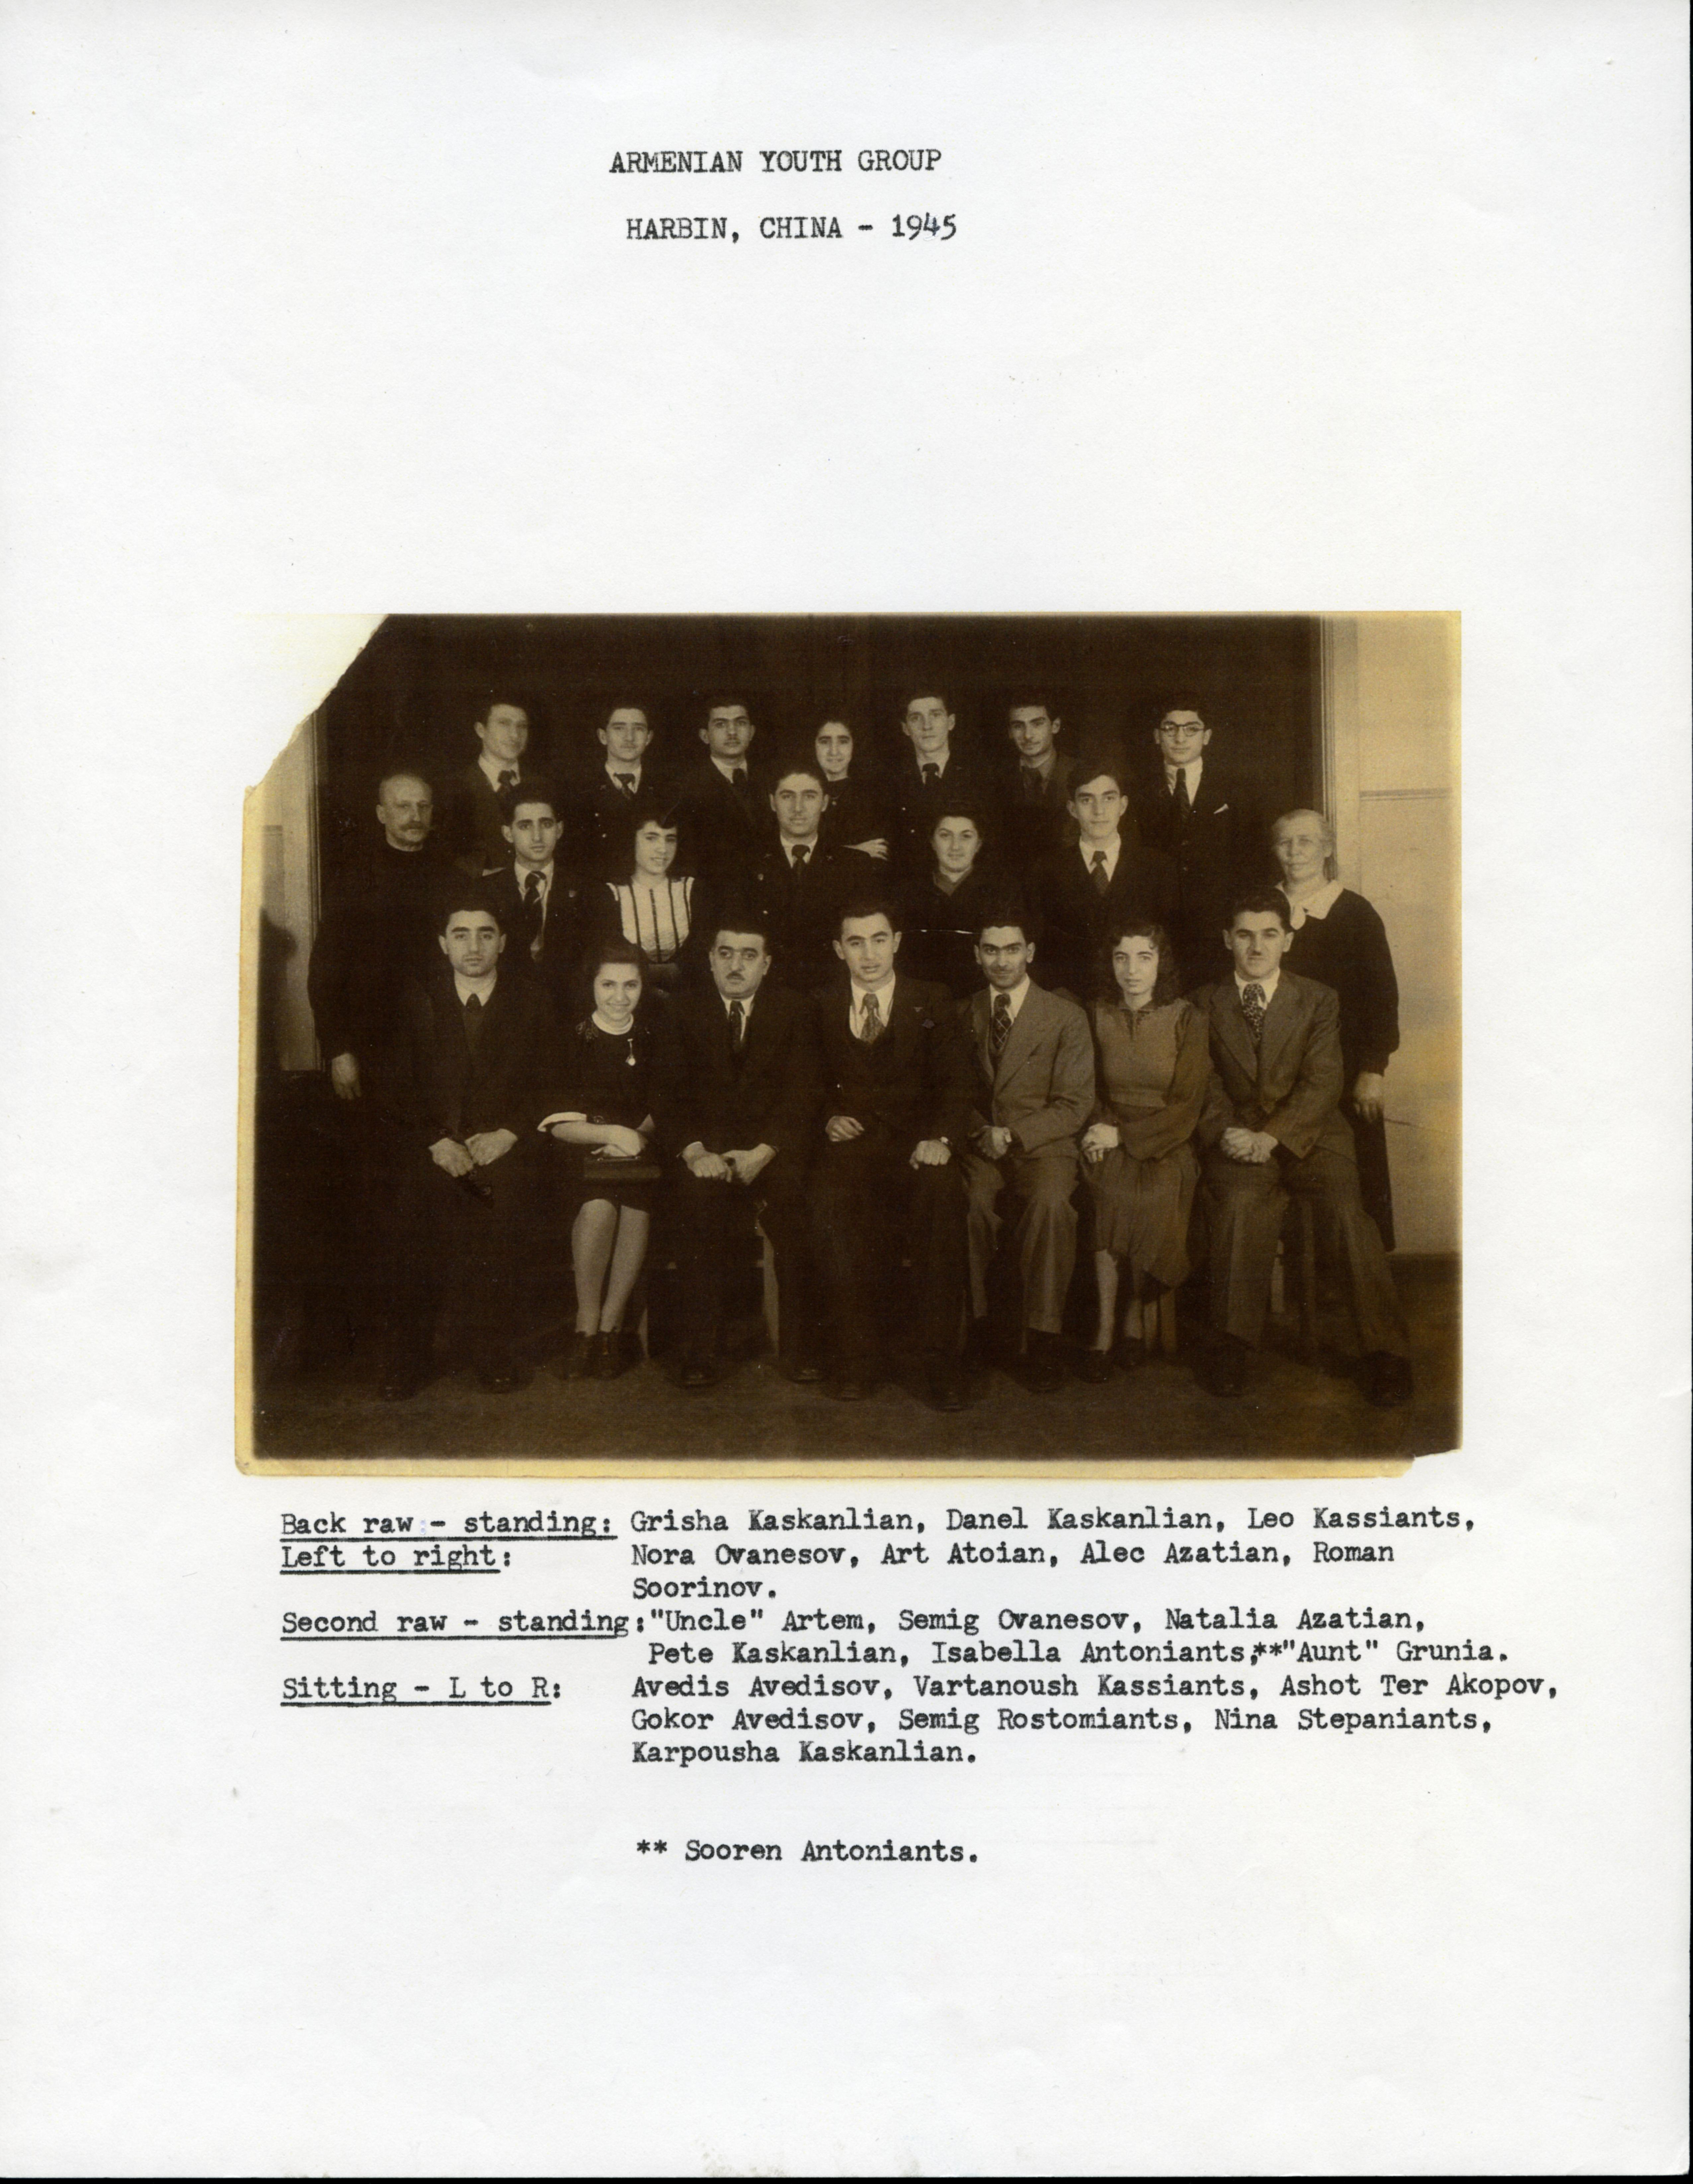 Armenian youth group, Harbin, China, c. 1945